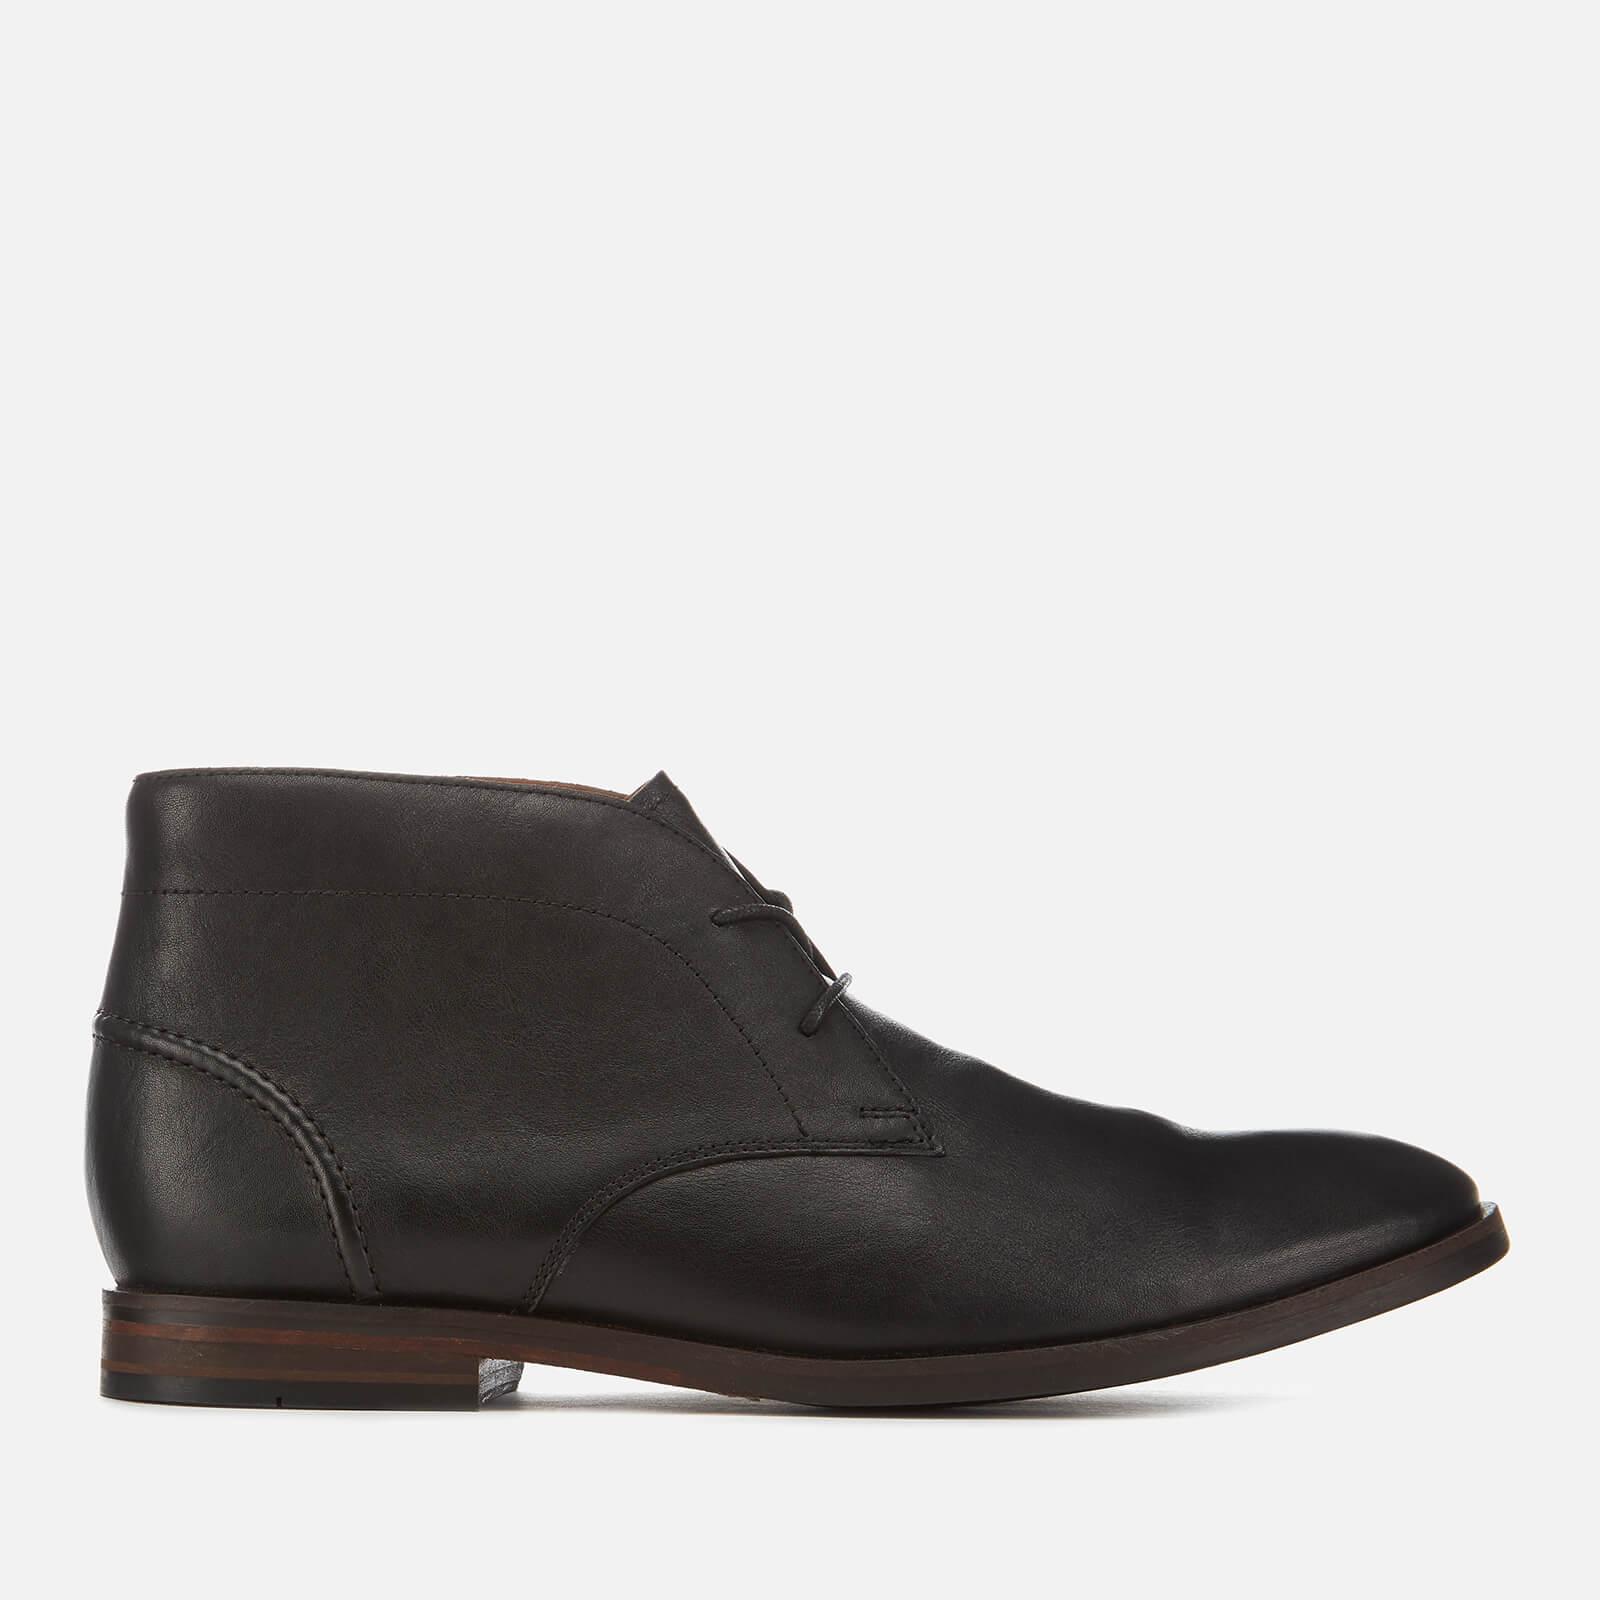 330cf145 Clarks Men's Glide Leather Chukka Boots - Black